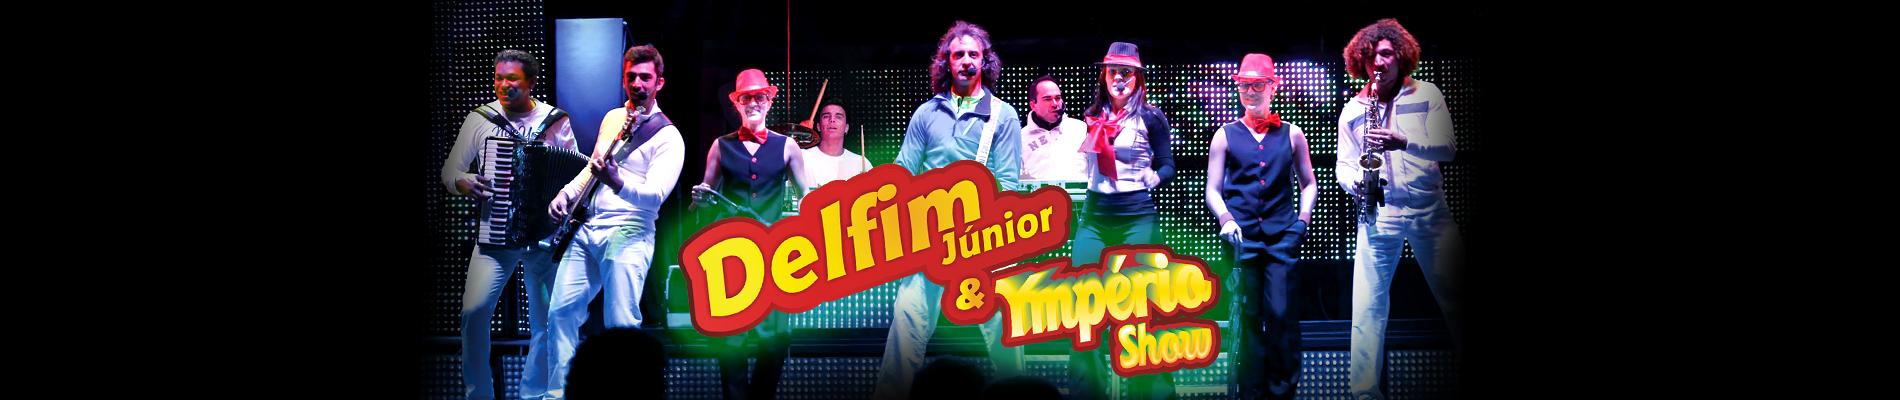 Delfim Junior e Ymperio Show